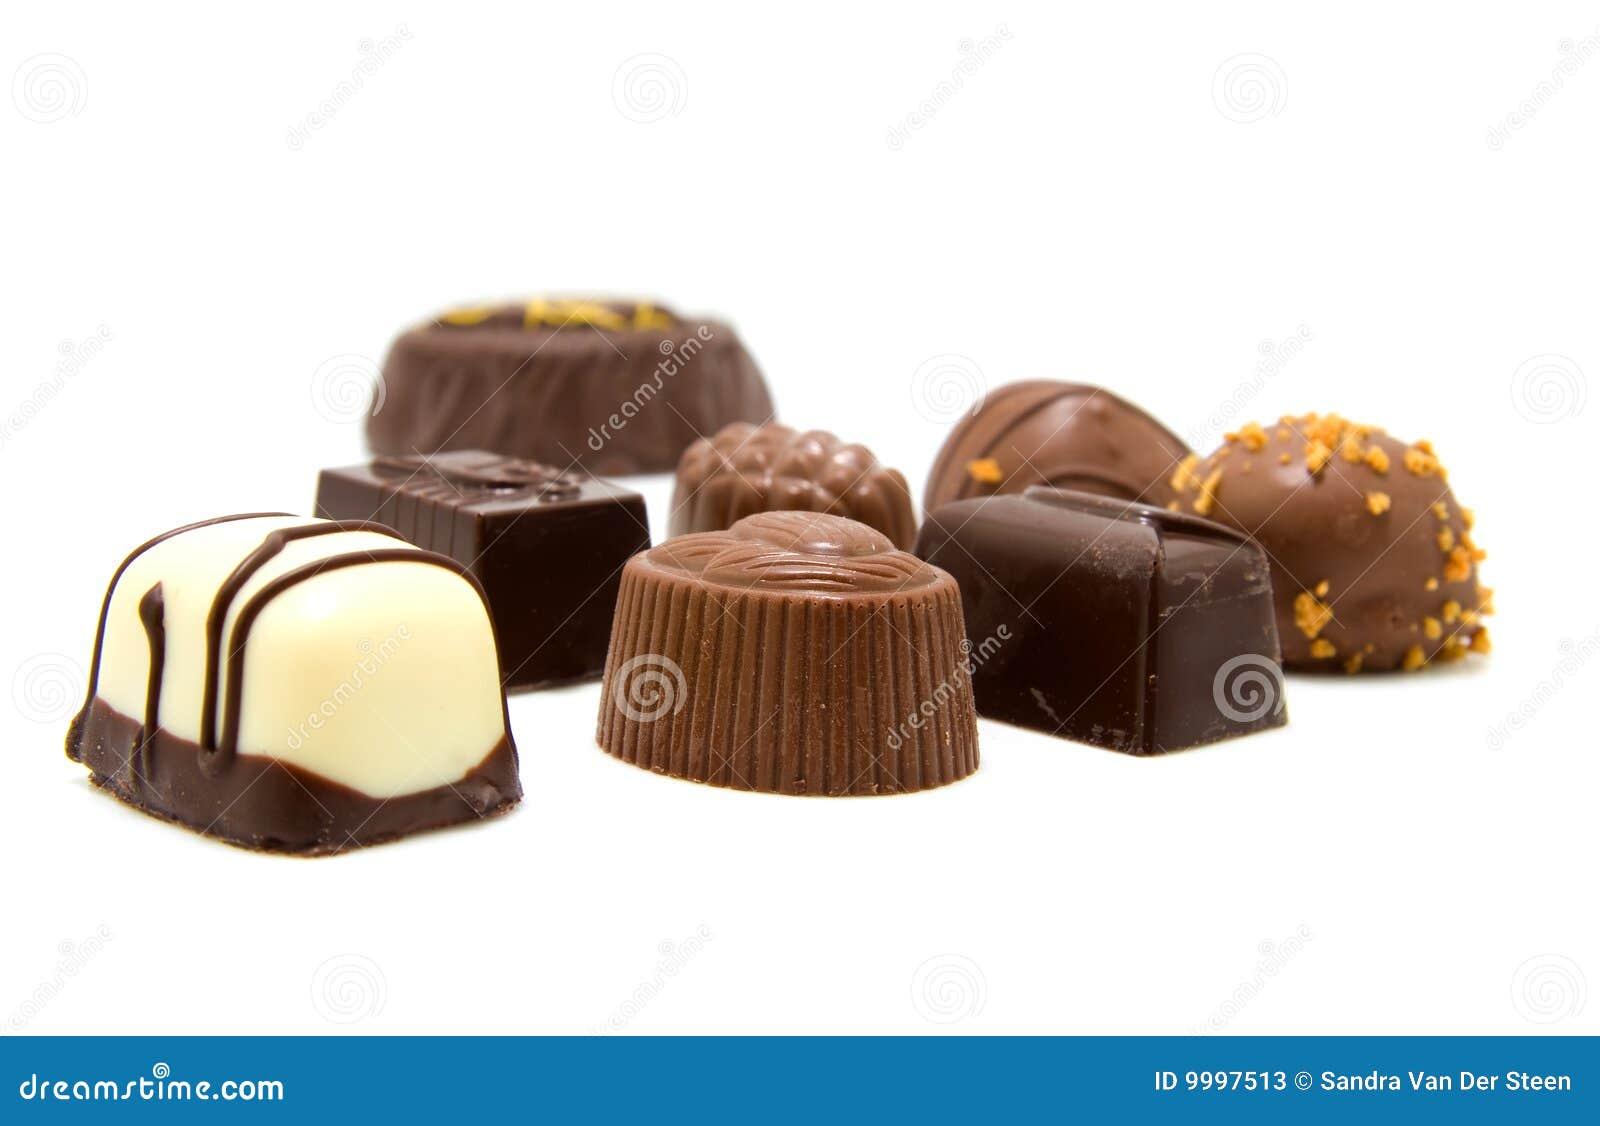 Chocolate Bonbons Stock Photos - Image: 9997513